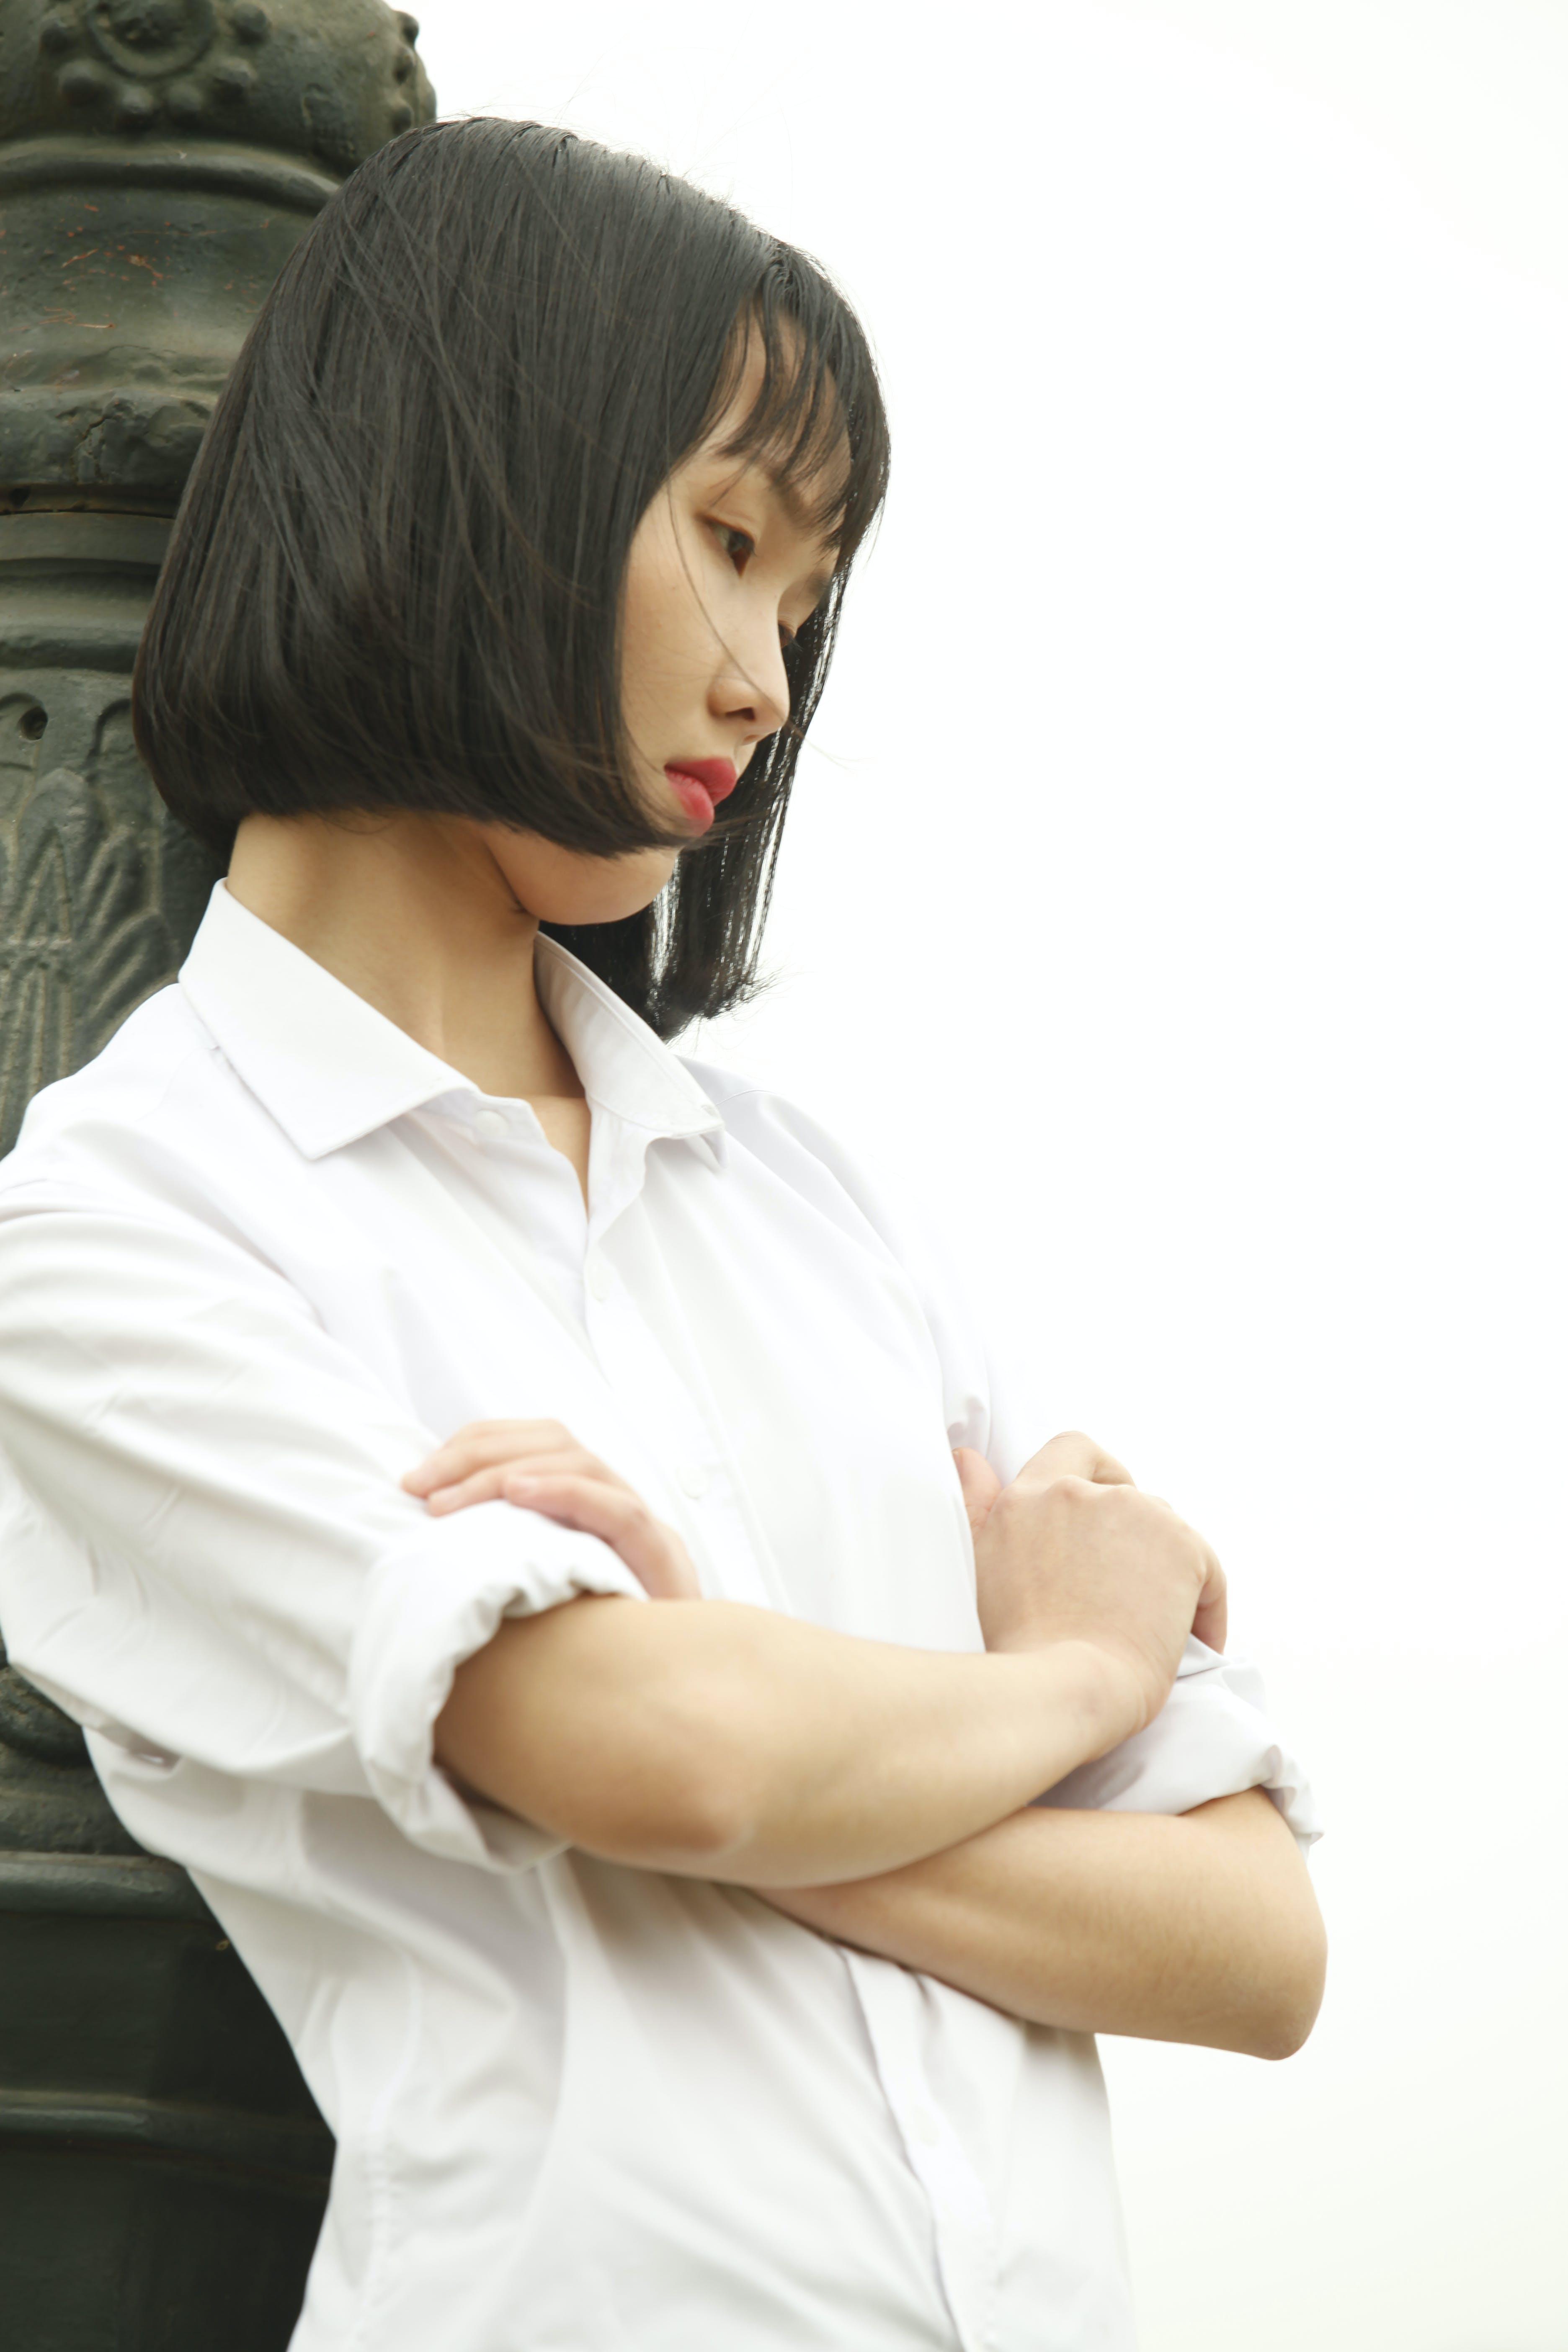 Woman Wearing White Dress Shirt Standing Near Concrete Statue